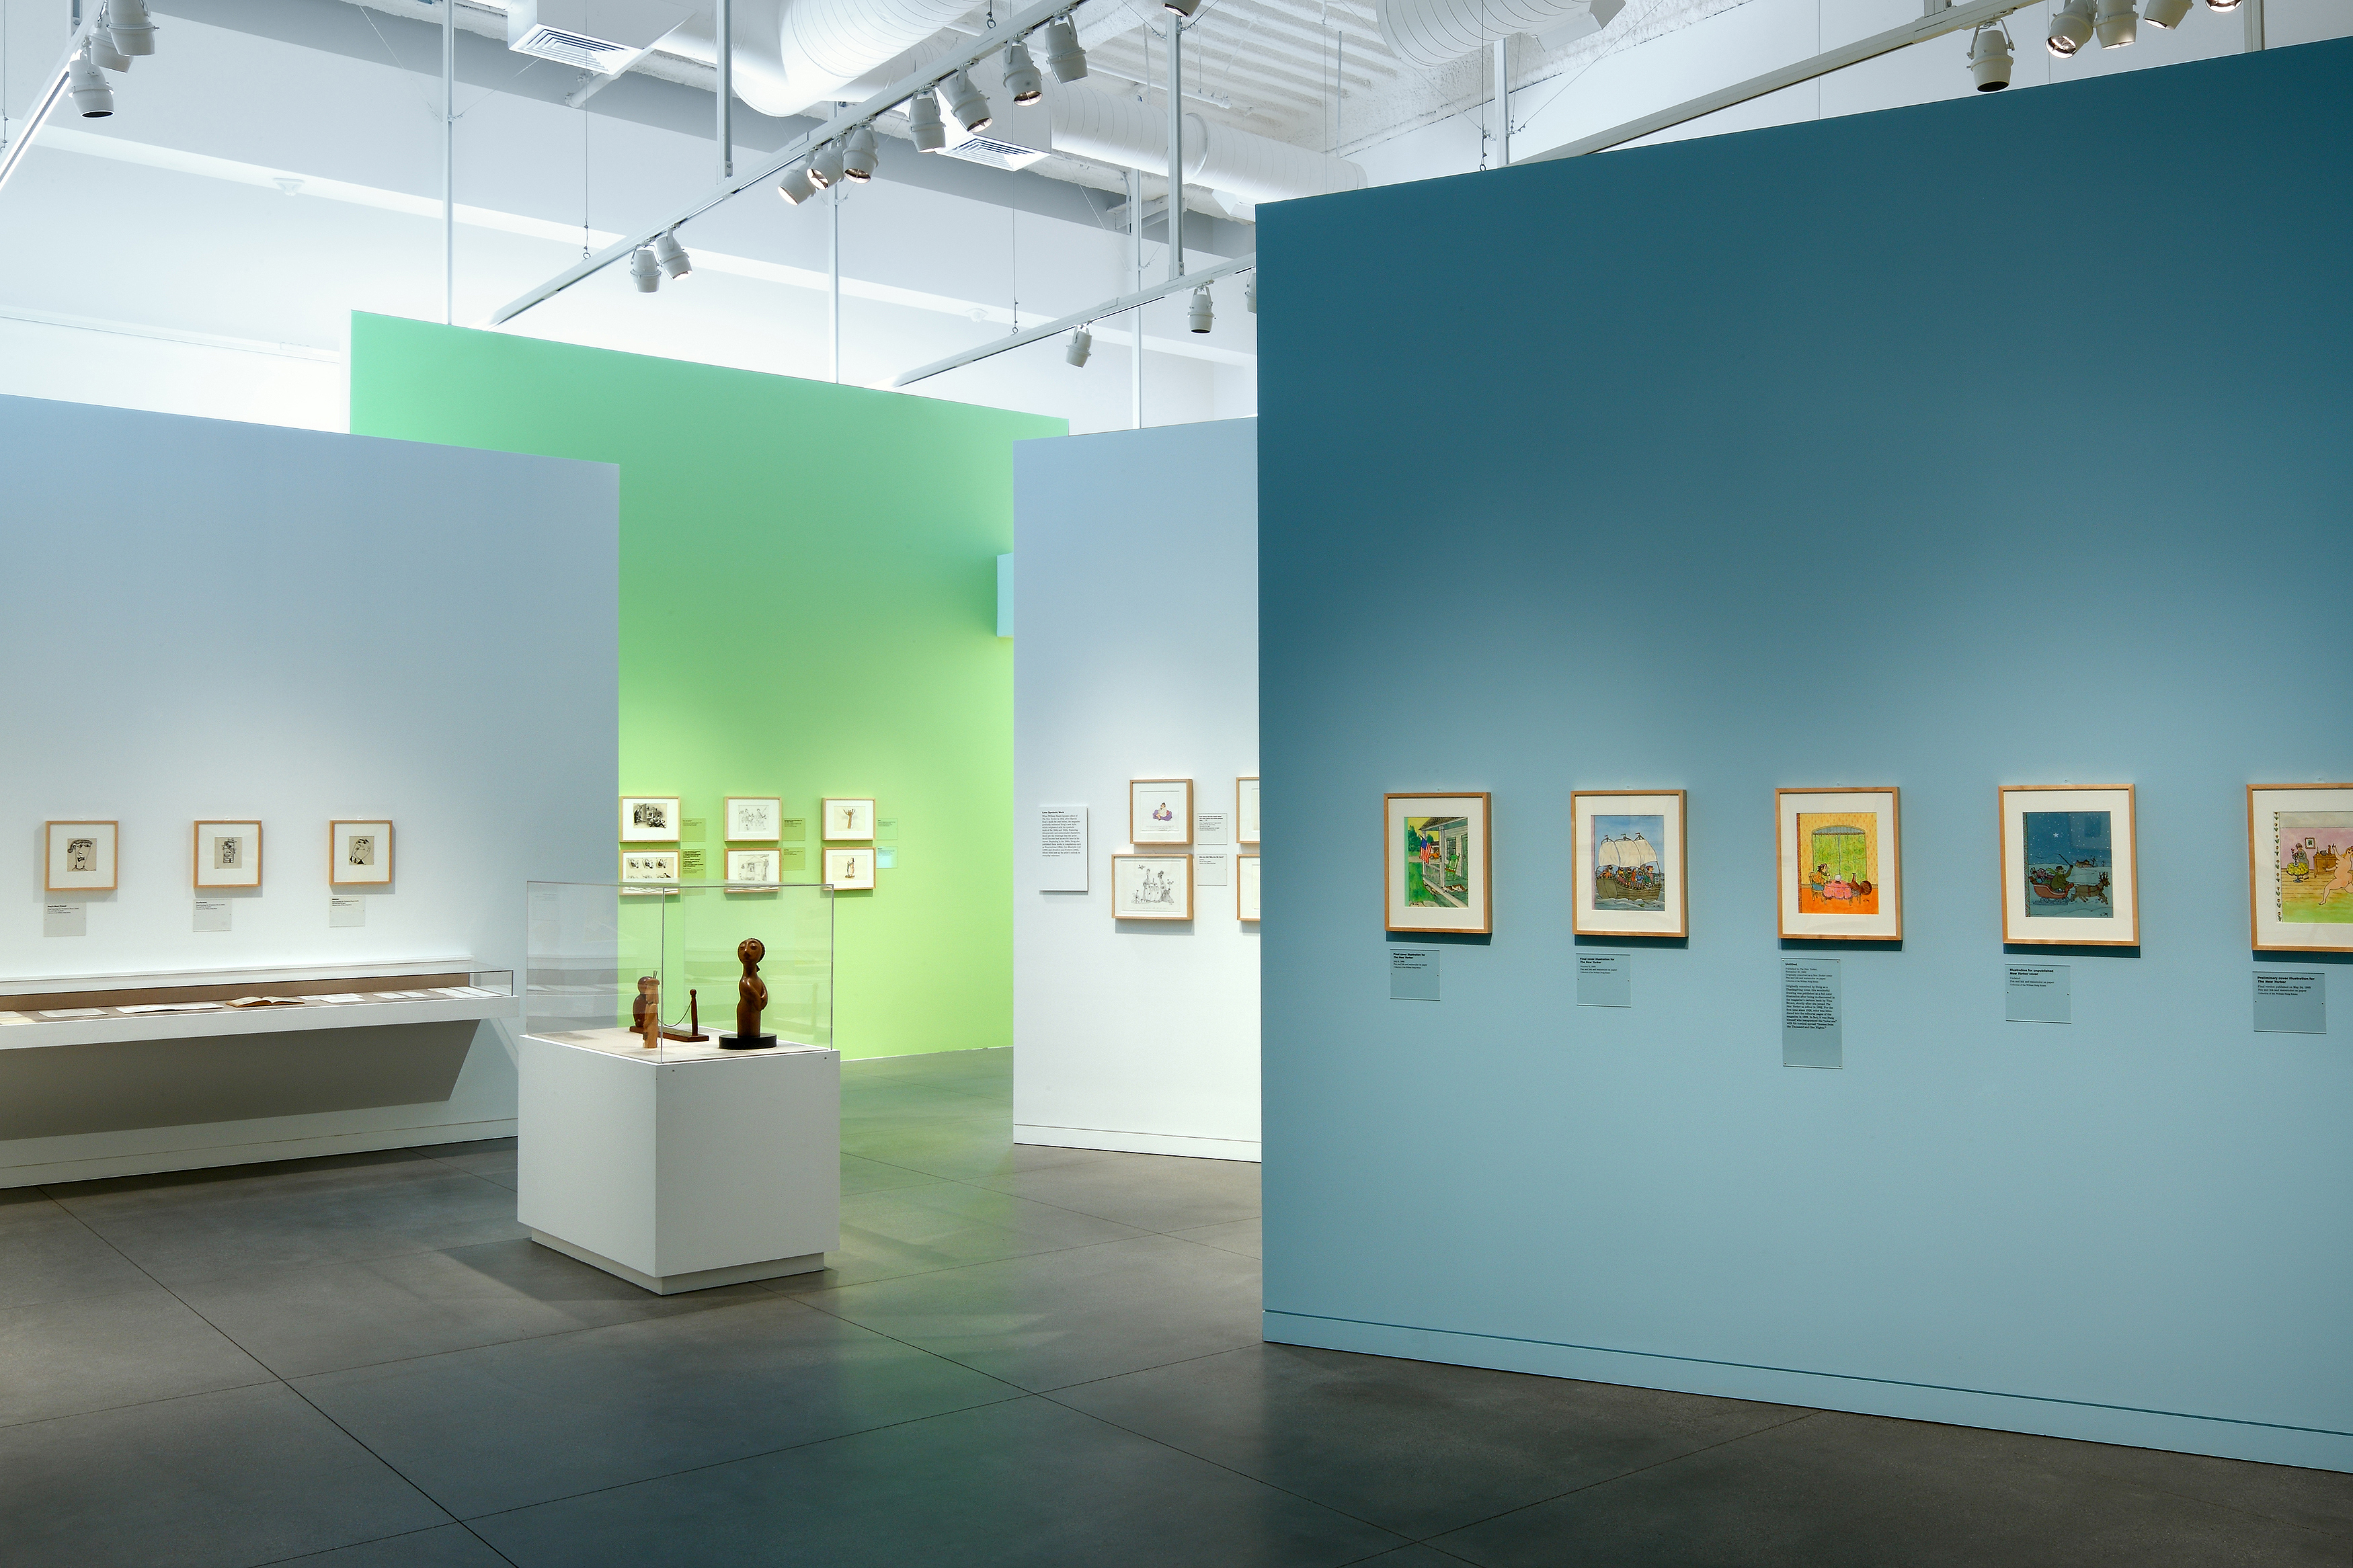 Contemporary jewish museum: per lefficienza energetica luce e design